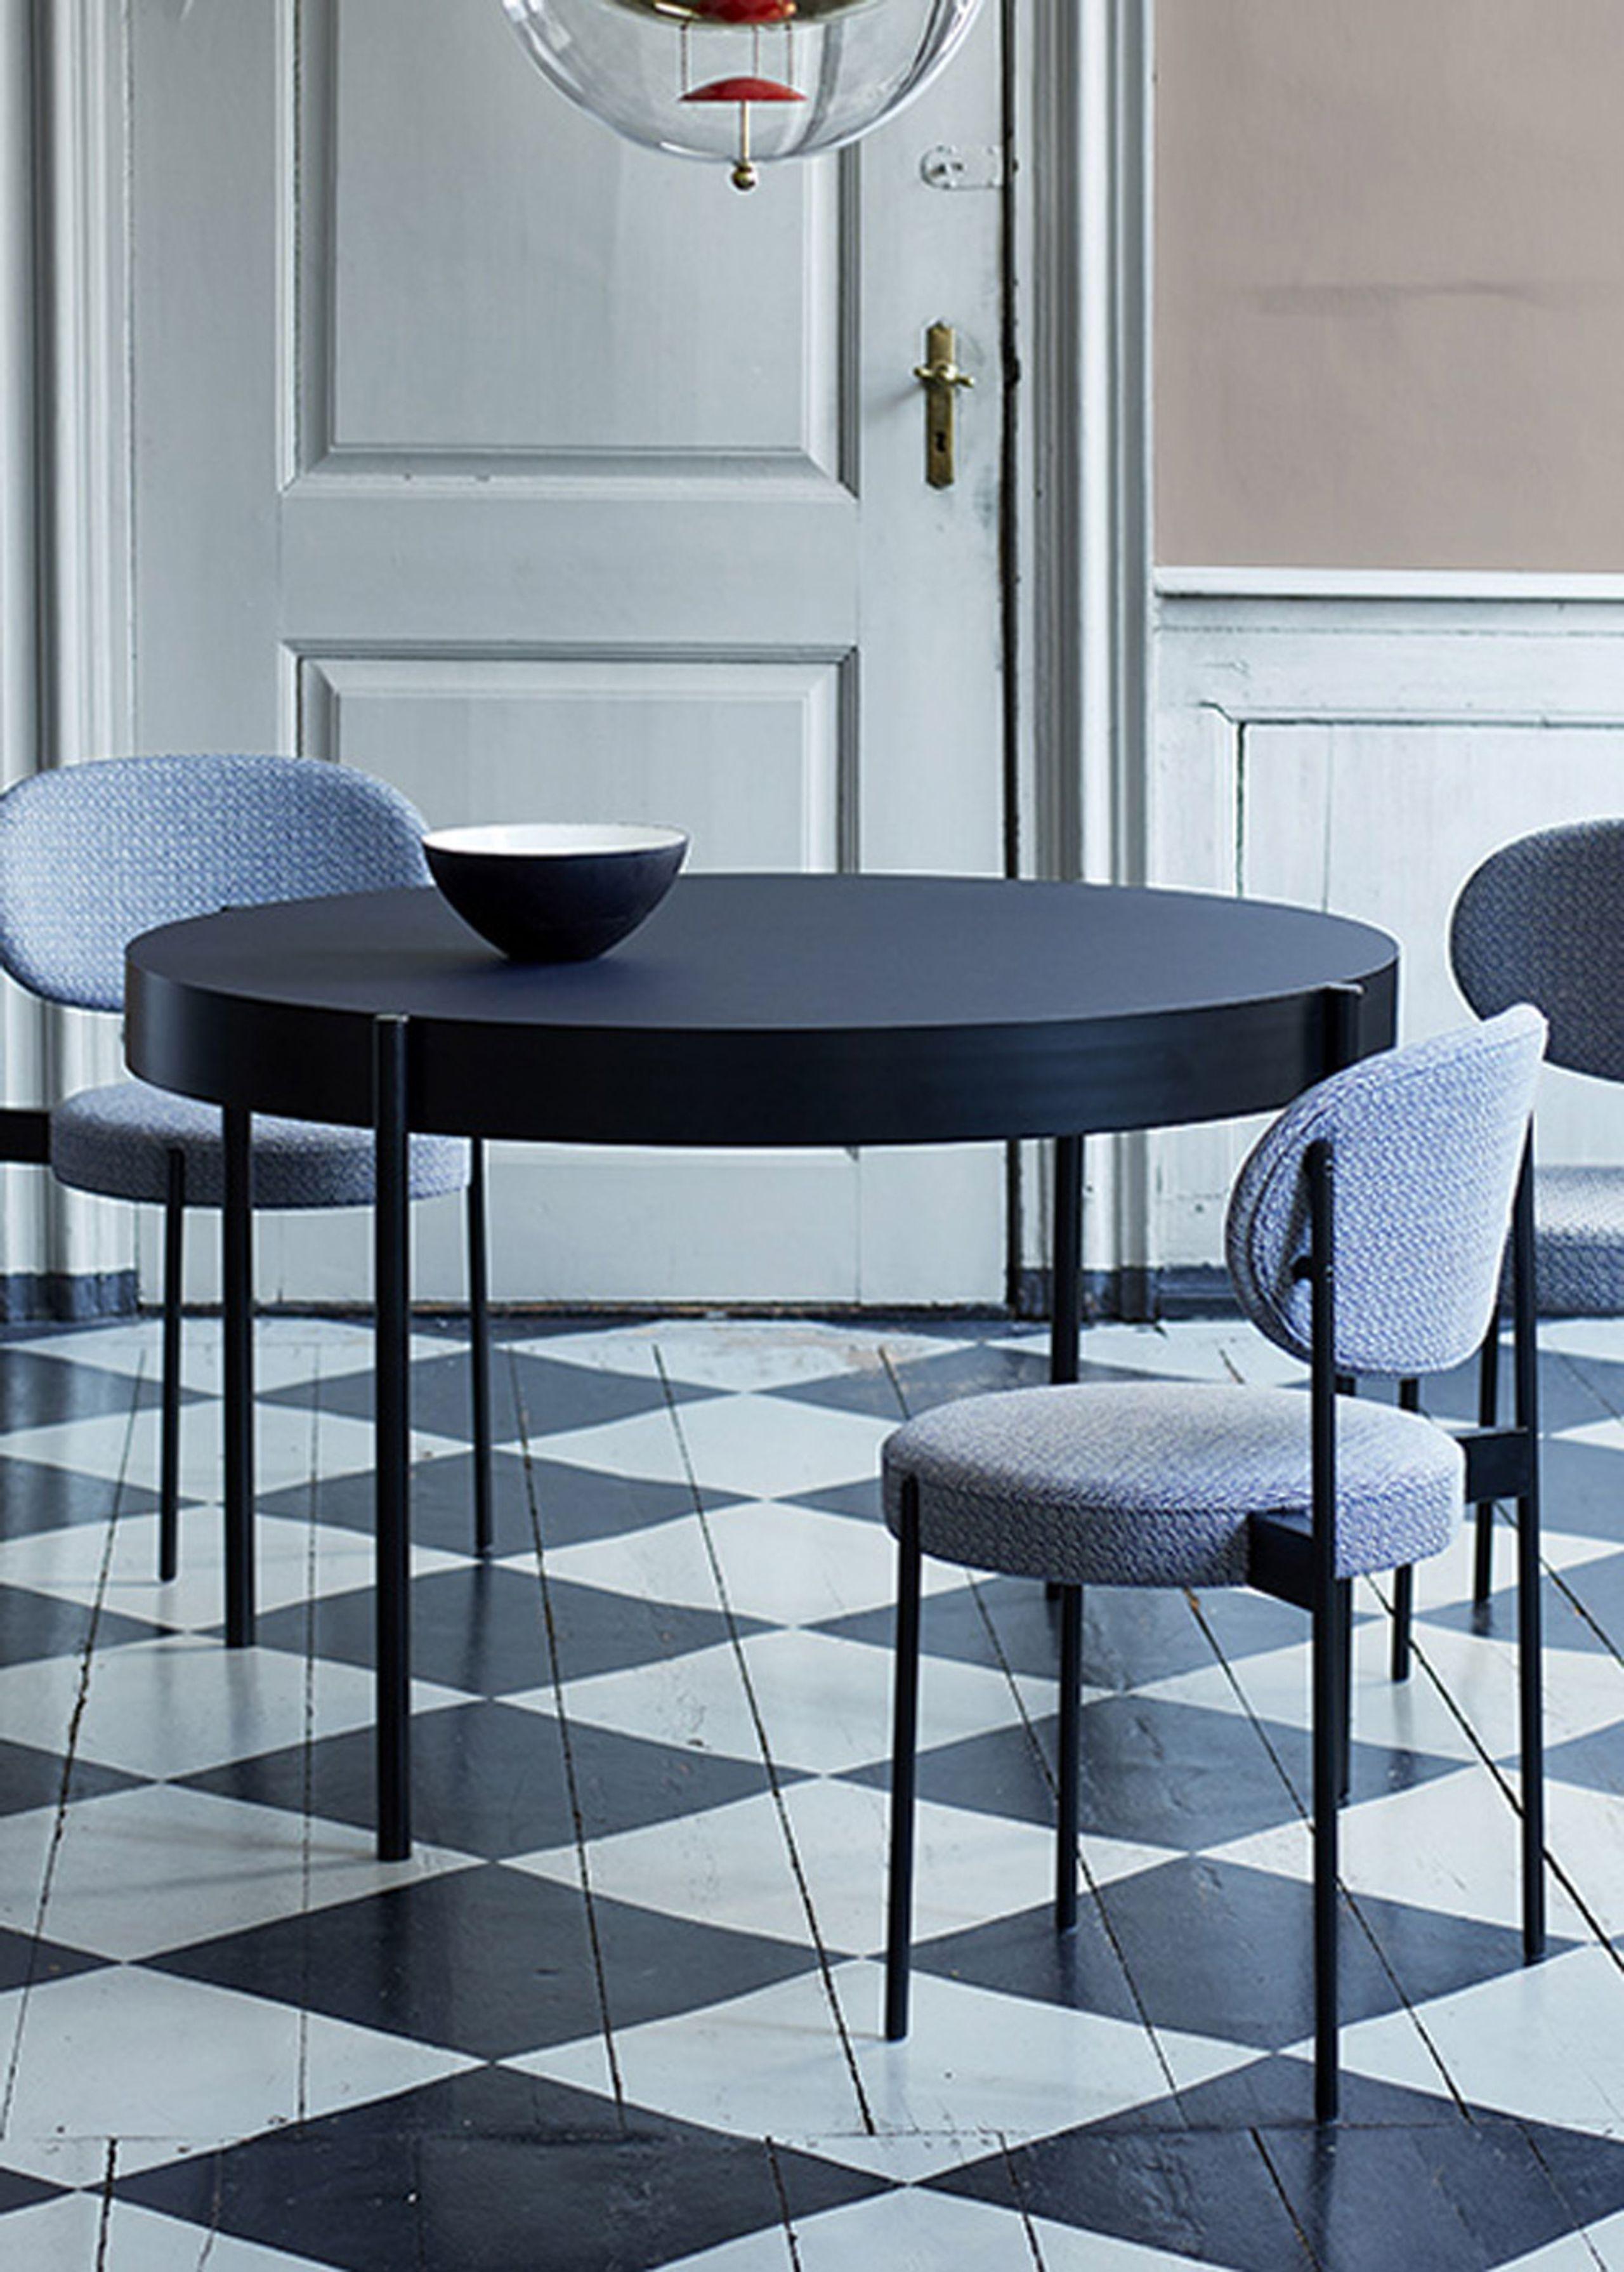 430 table by verner panton bord verpan. Black Bedroom Furniture Sets. Home Design Ideas